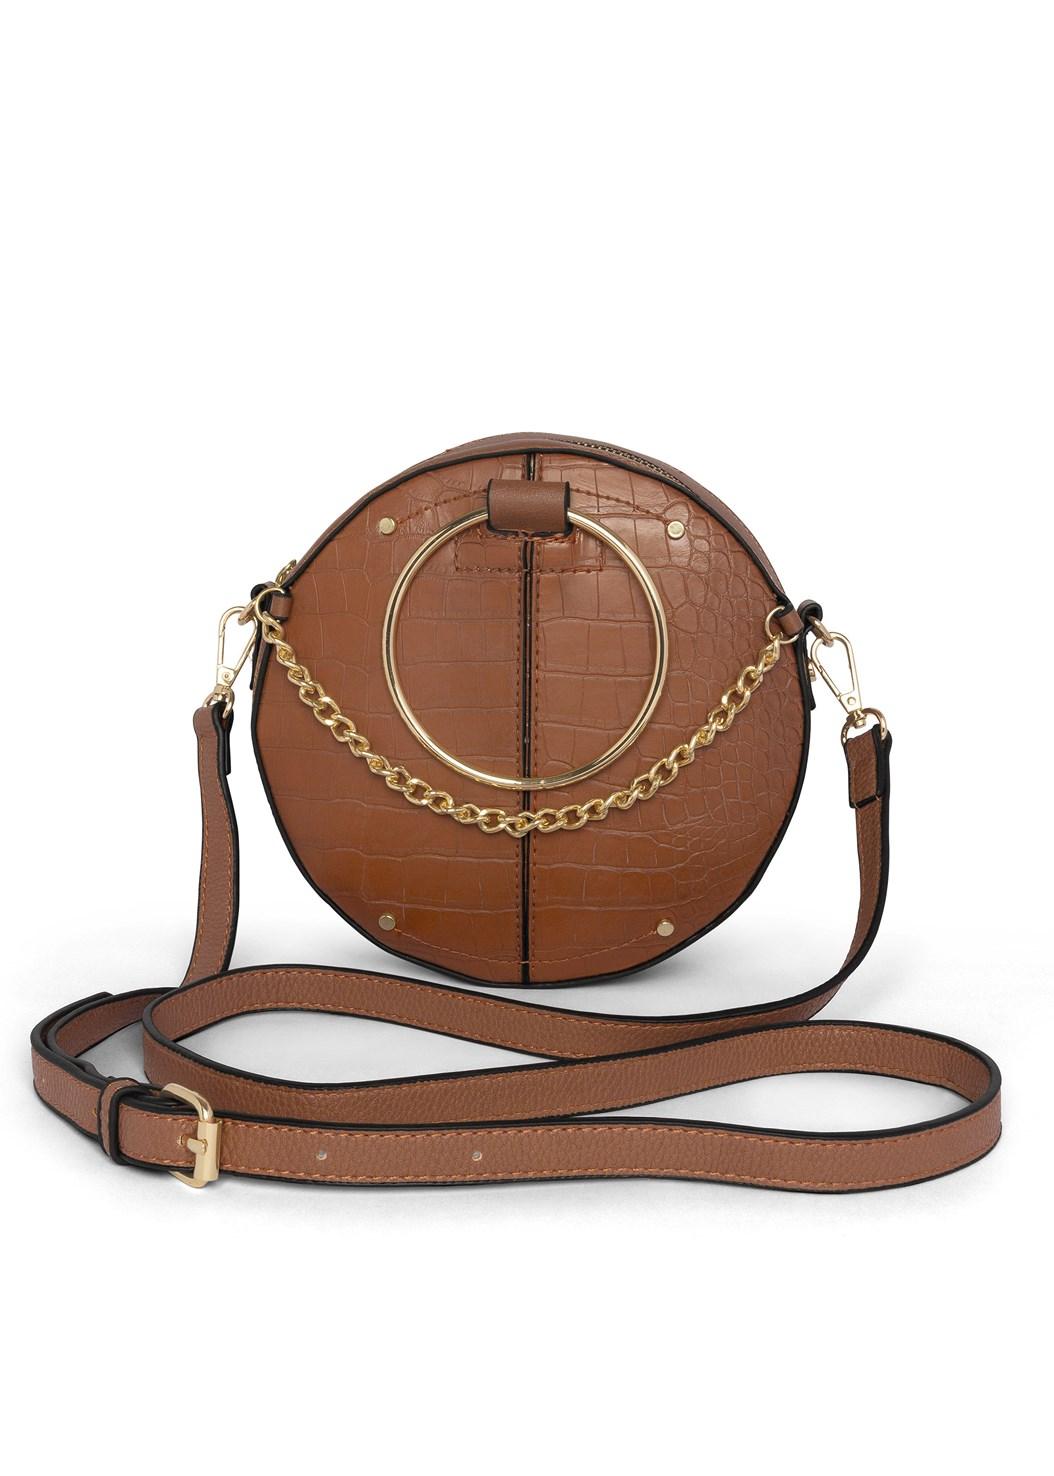 Circle Ring Detail Handbag,Lace Up Tweed Top,Casual Bootcut Jeans